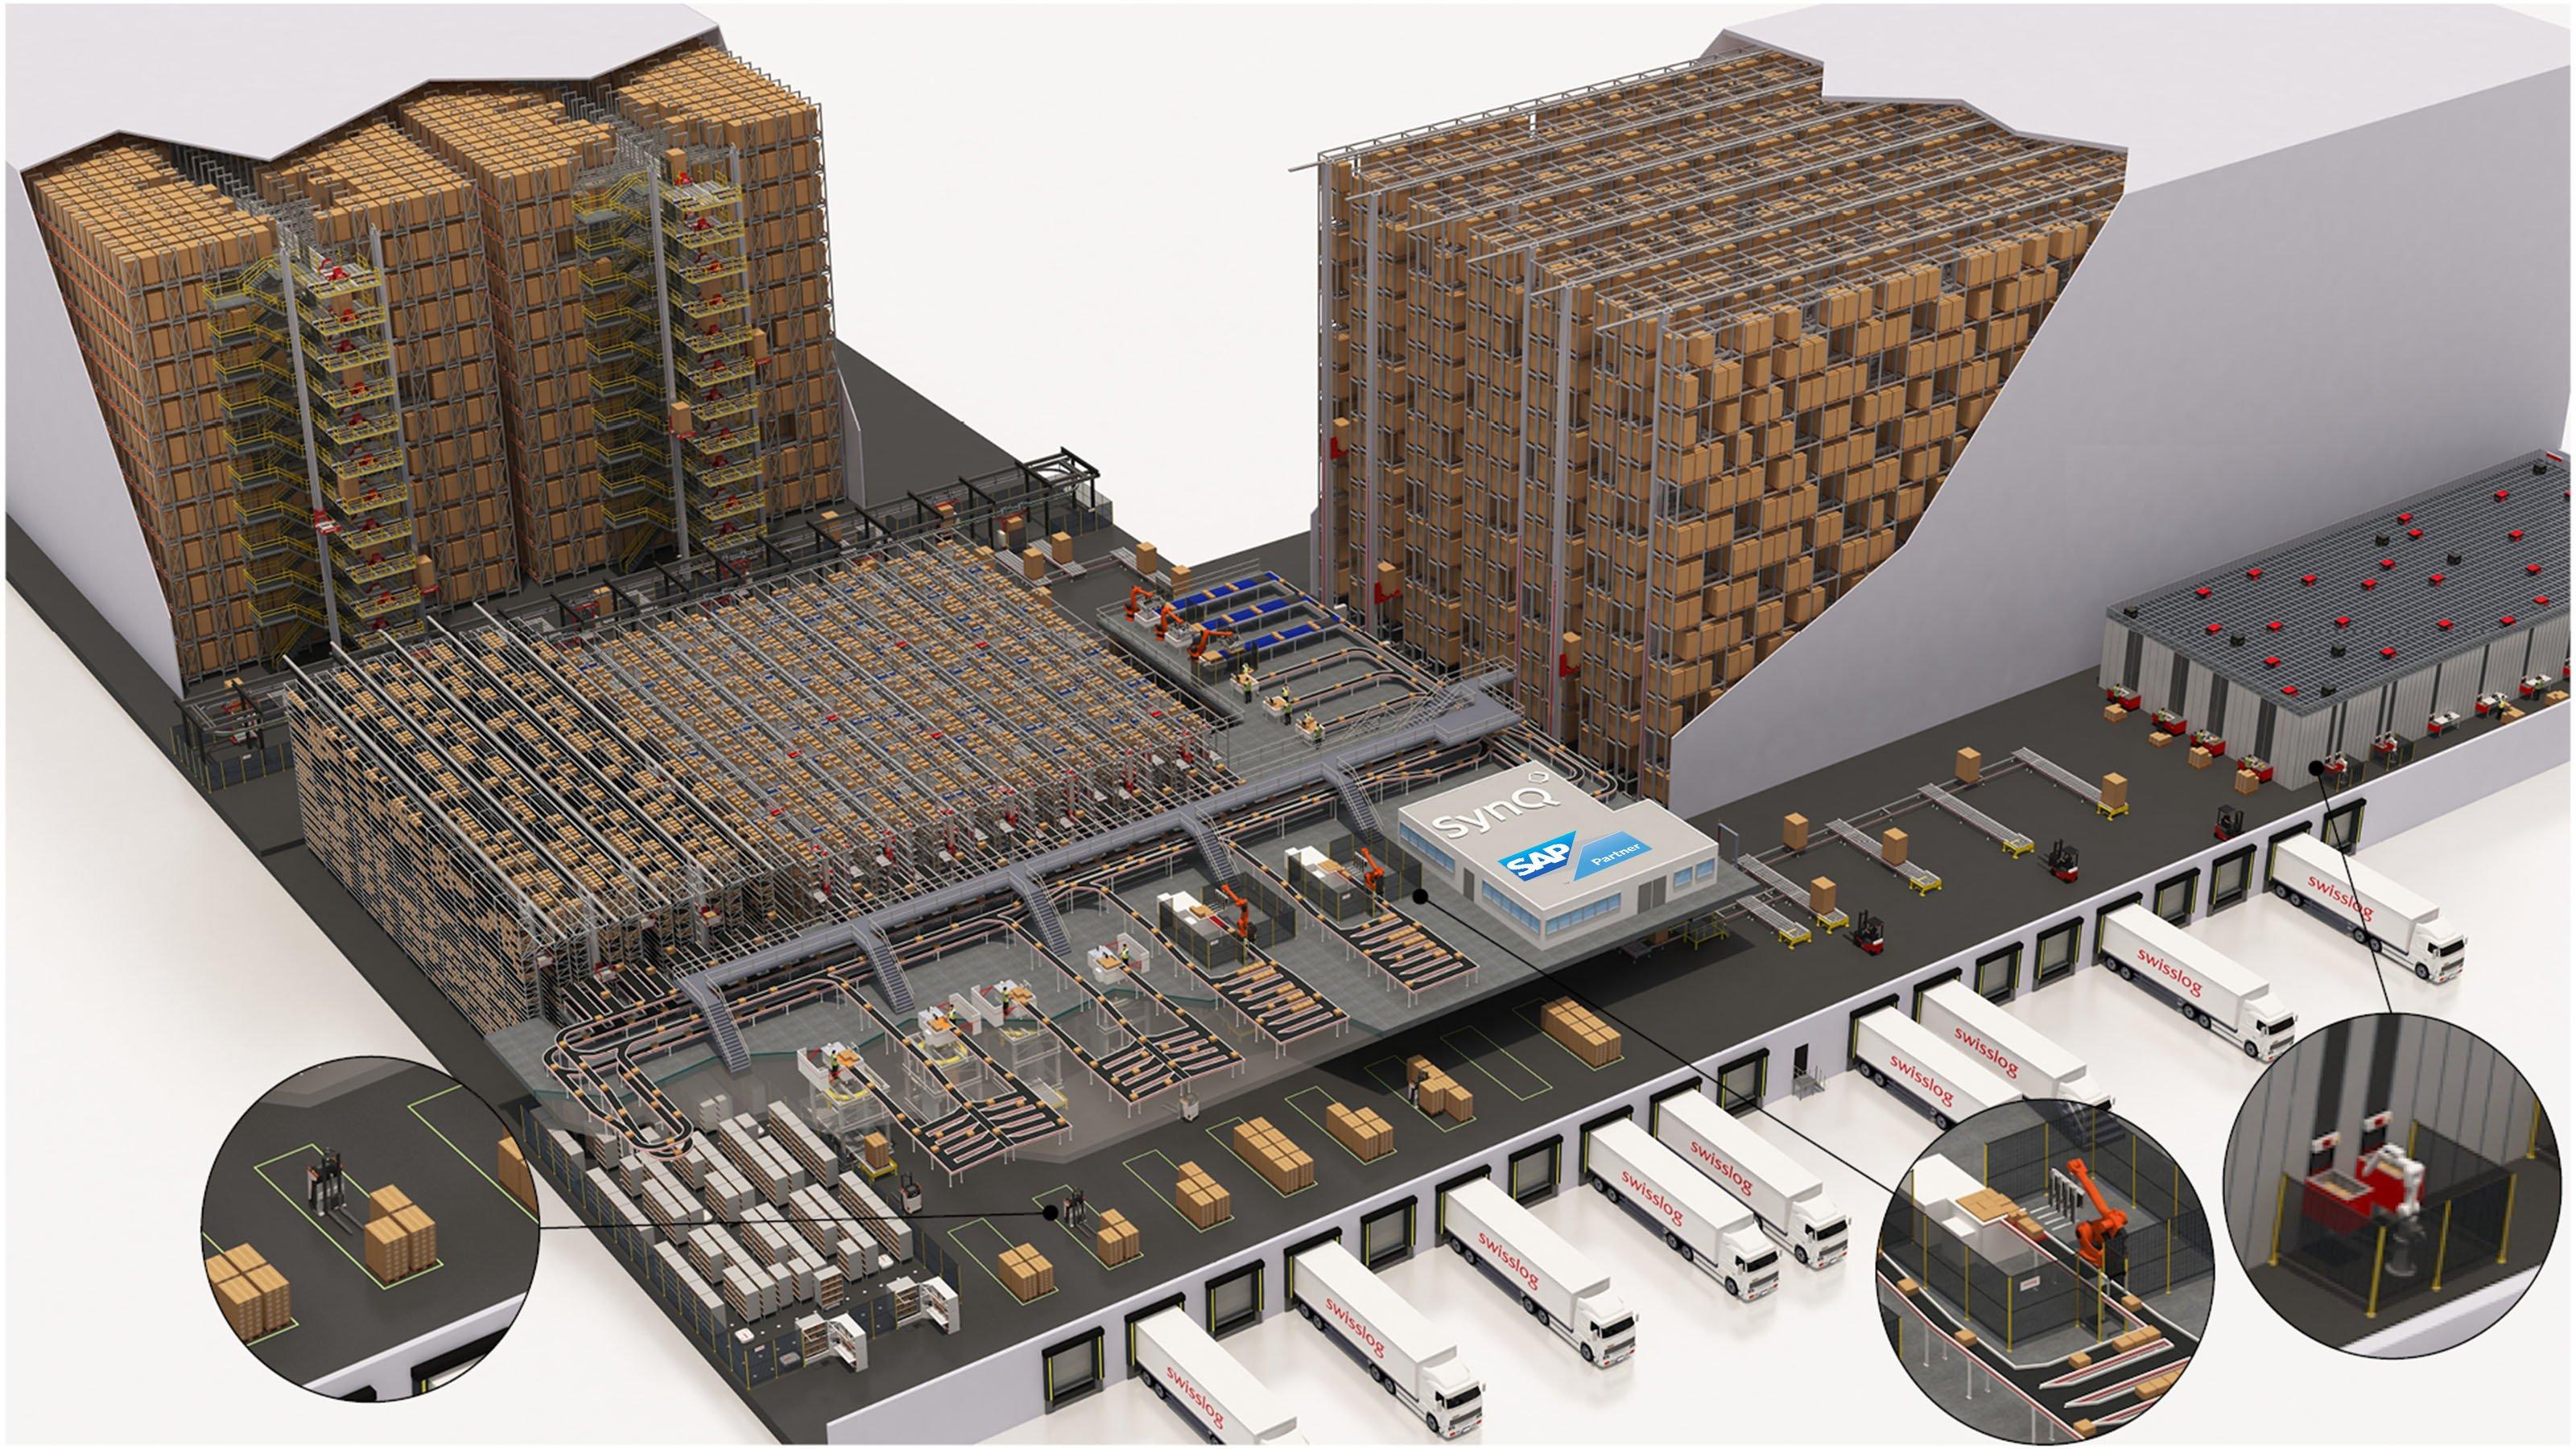 About Swisslog Logistics Automation  Robotic & data-driven